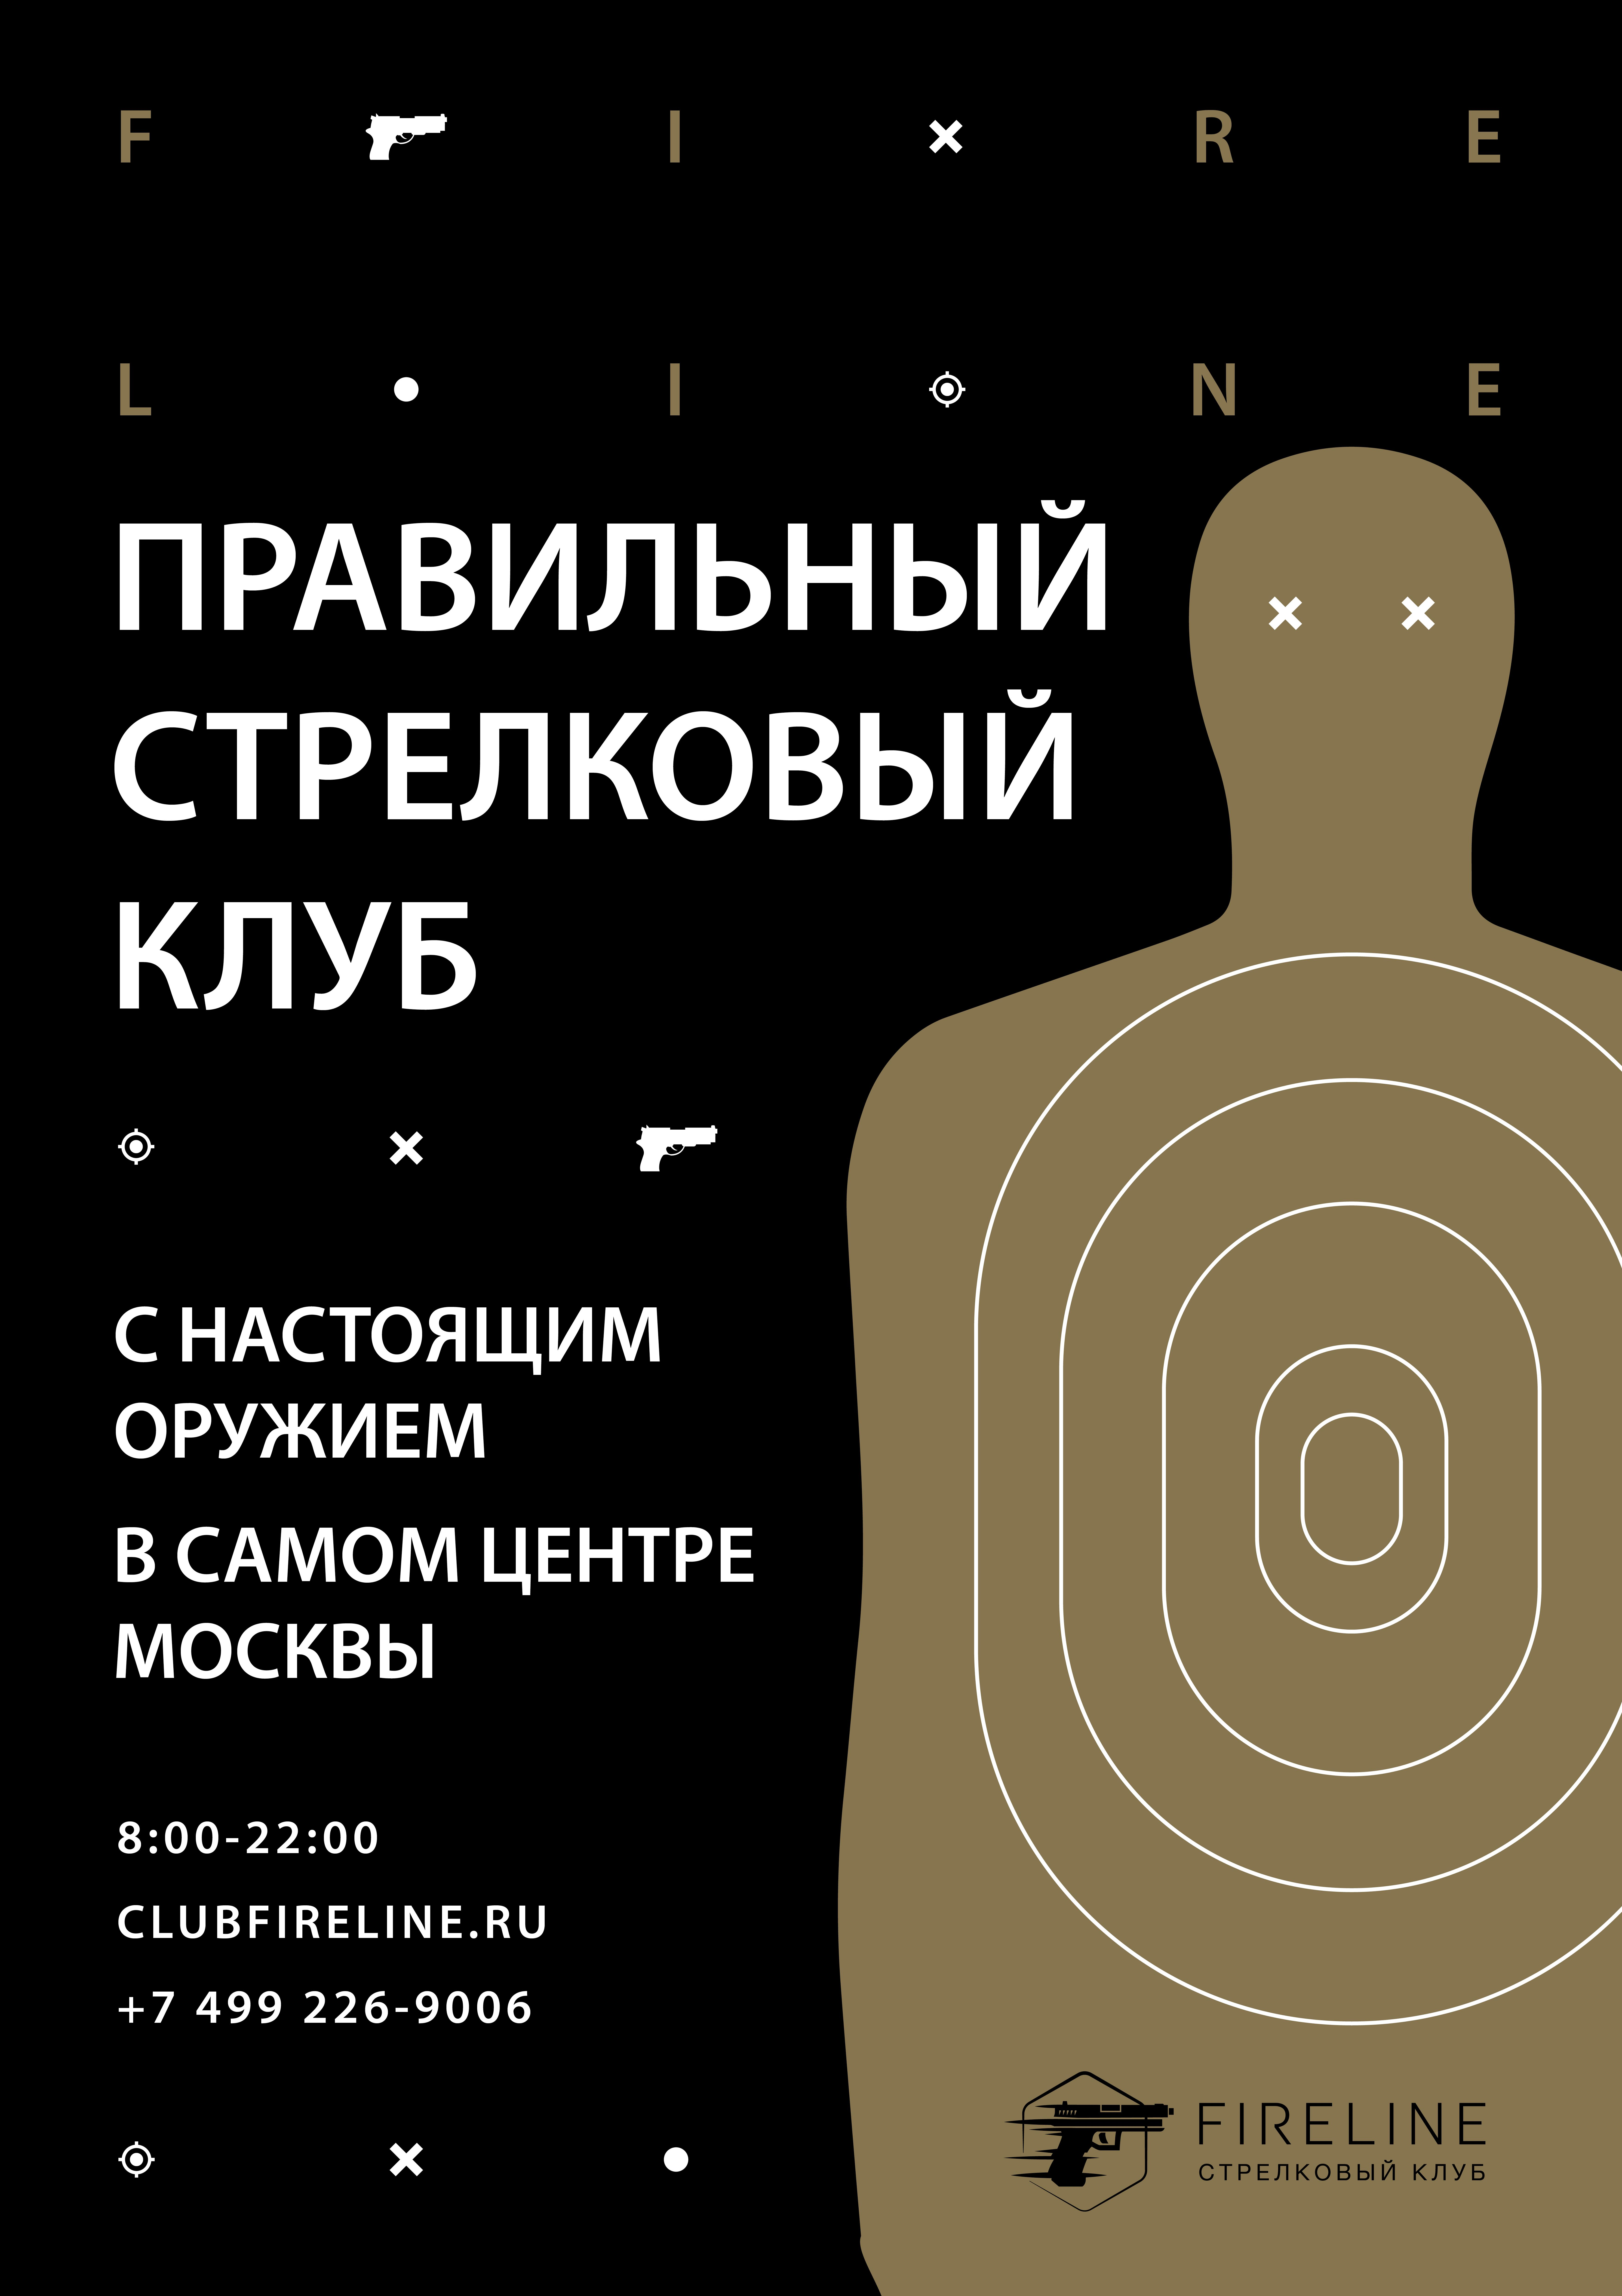 Создание дизайна для постера кристалайт фото f_0845e7a5840742a8.png